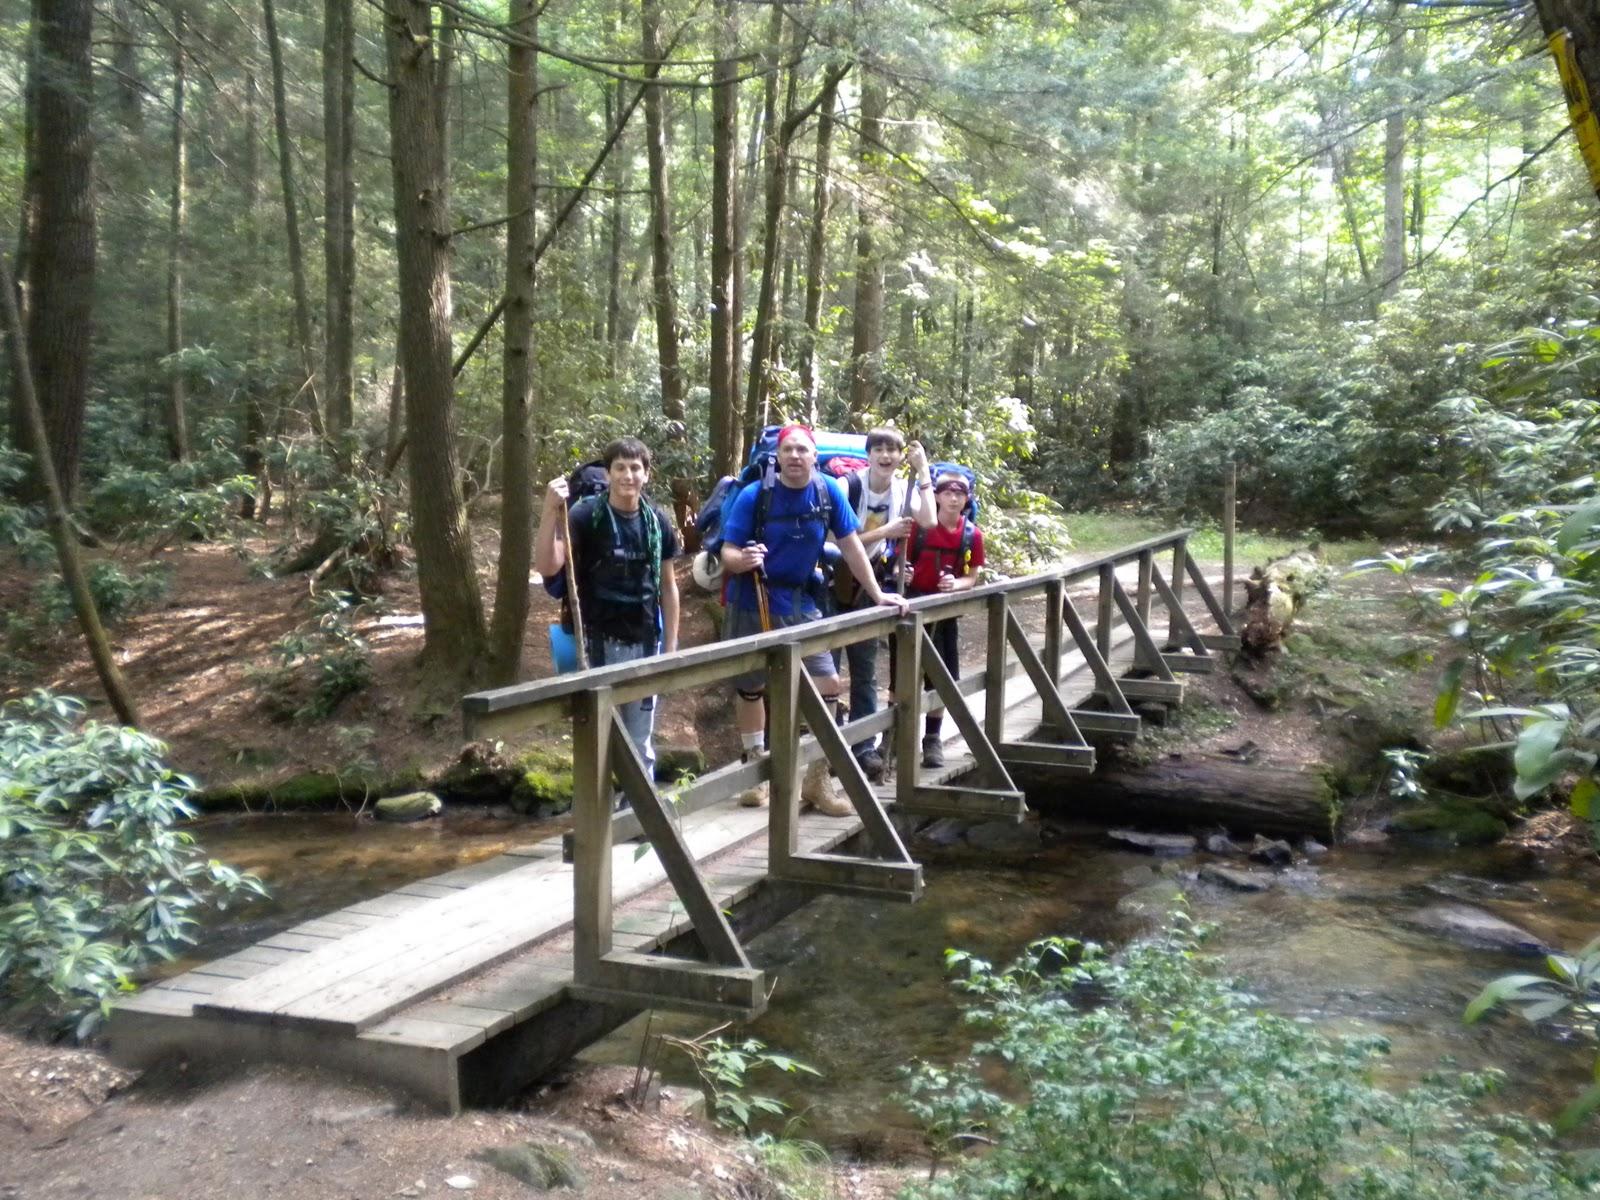 Appalachian Trail Mileage Chart : Facts & Information : SummitPost